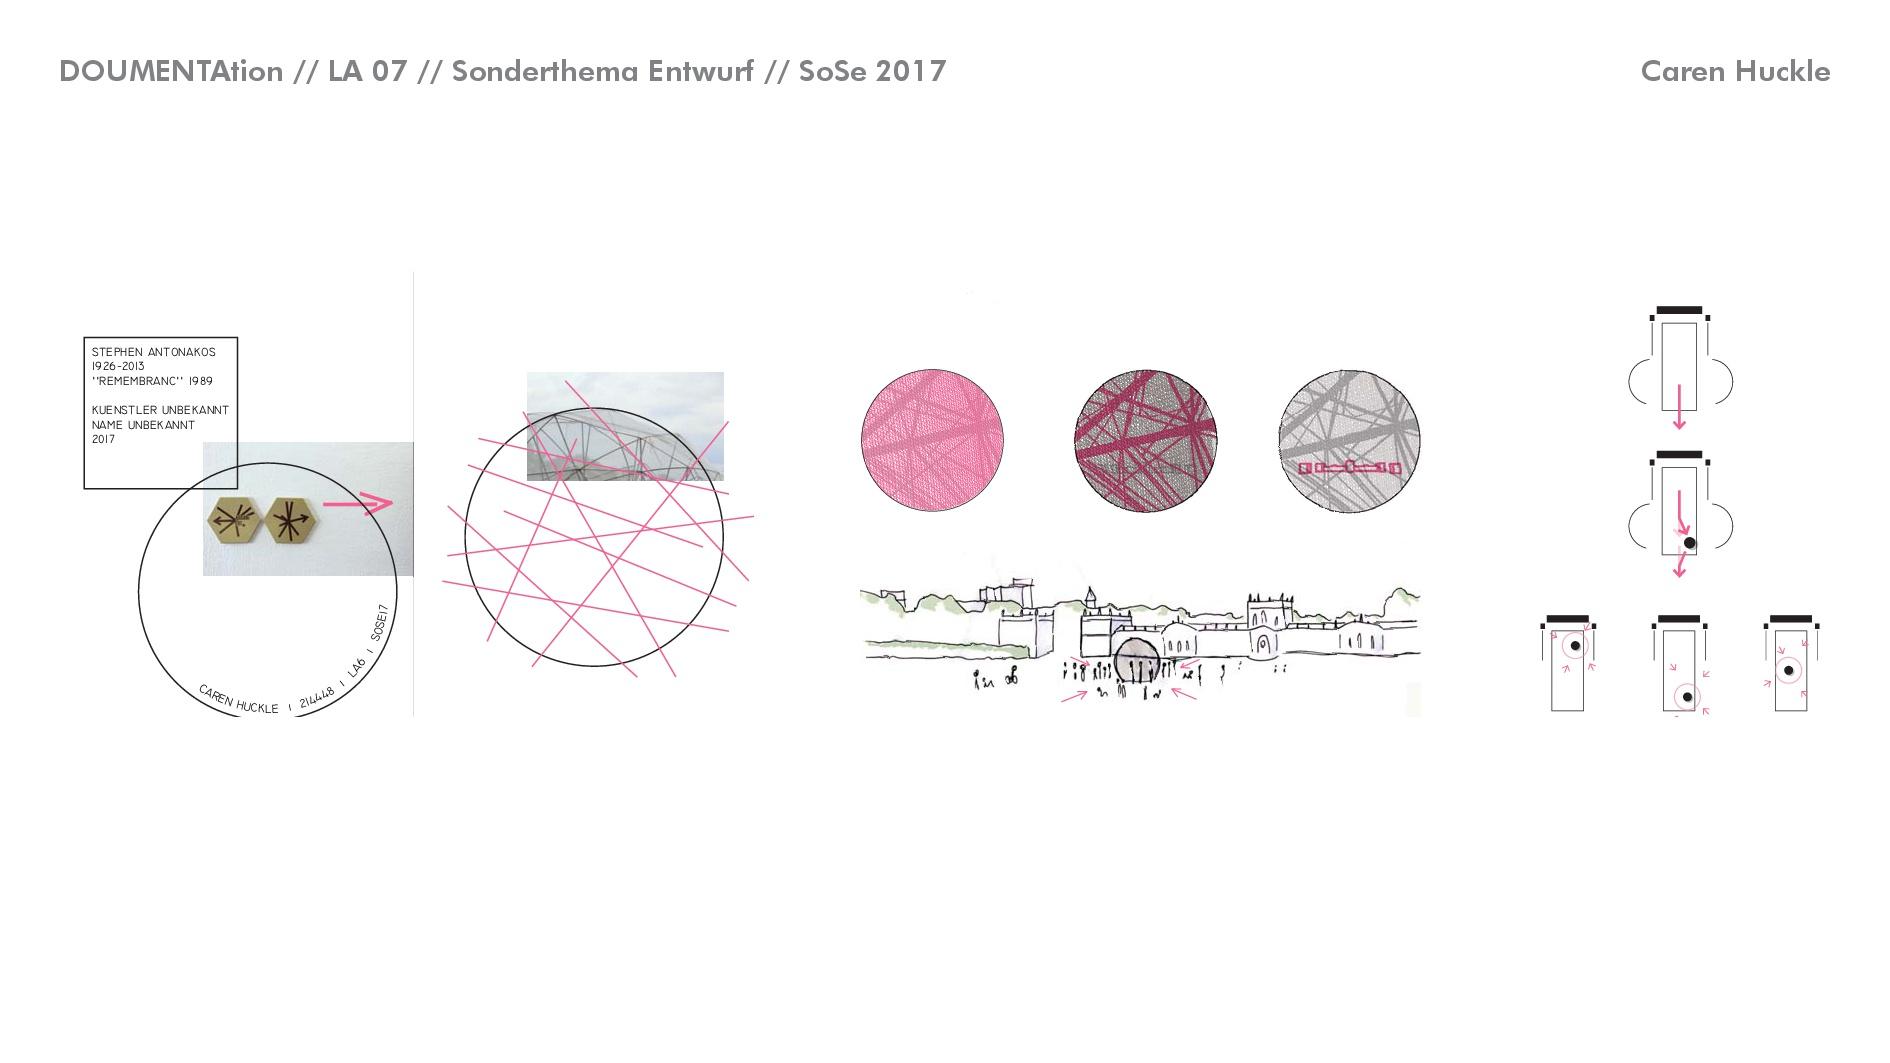 NEU Sonderthema Entwerfen SoSe 17 003